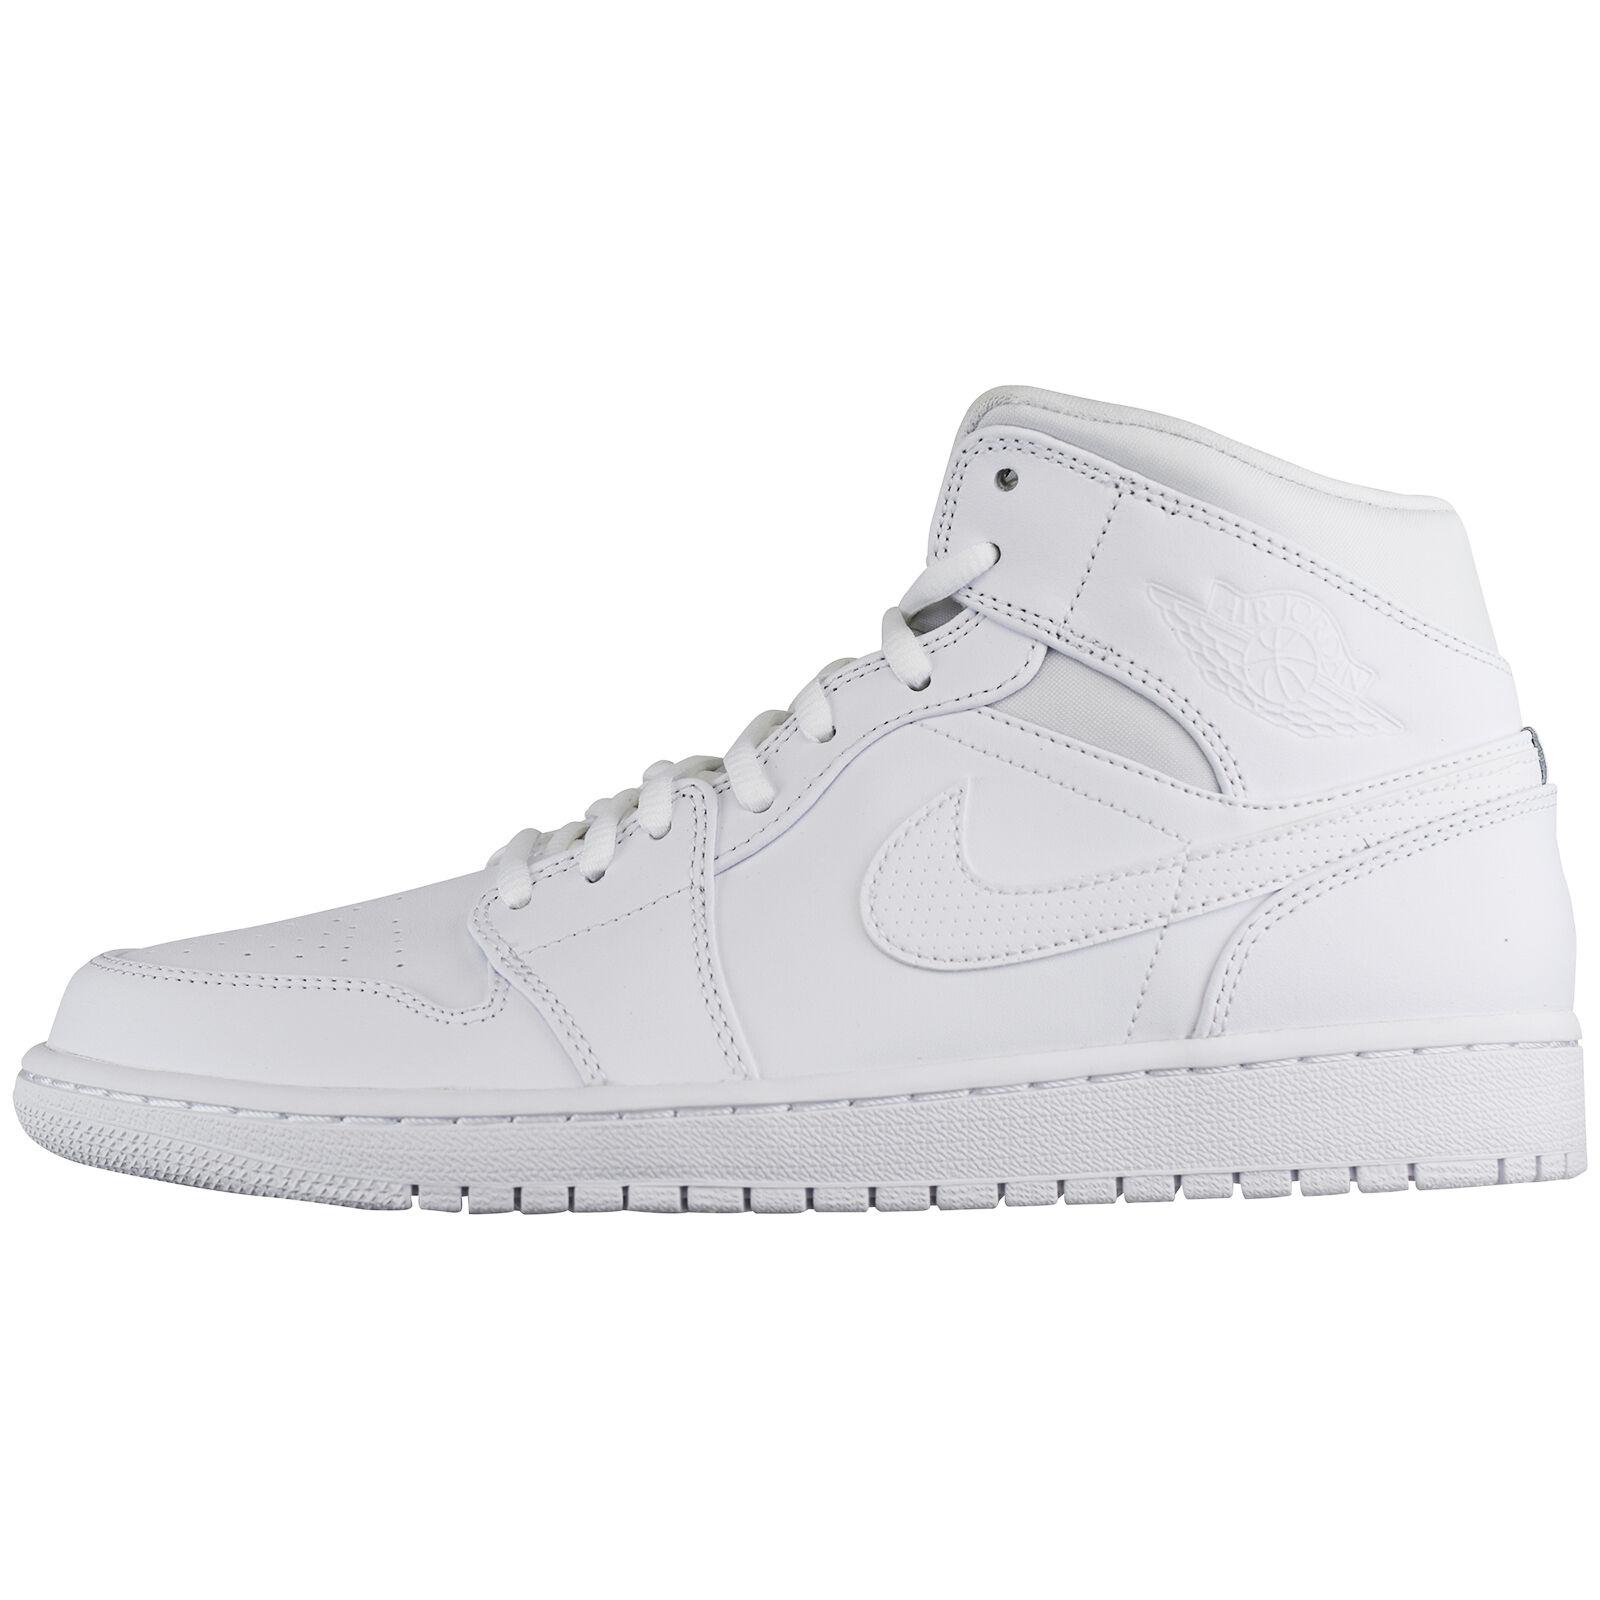 Nike Air Jordan 1 Mid 554724-110 Basketball Running Shoes Run Casual Trainers